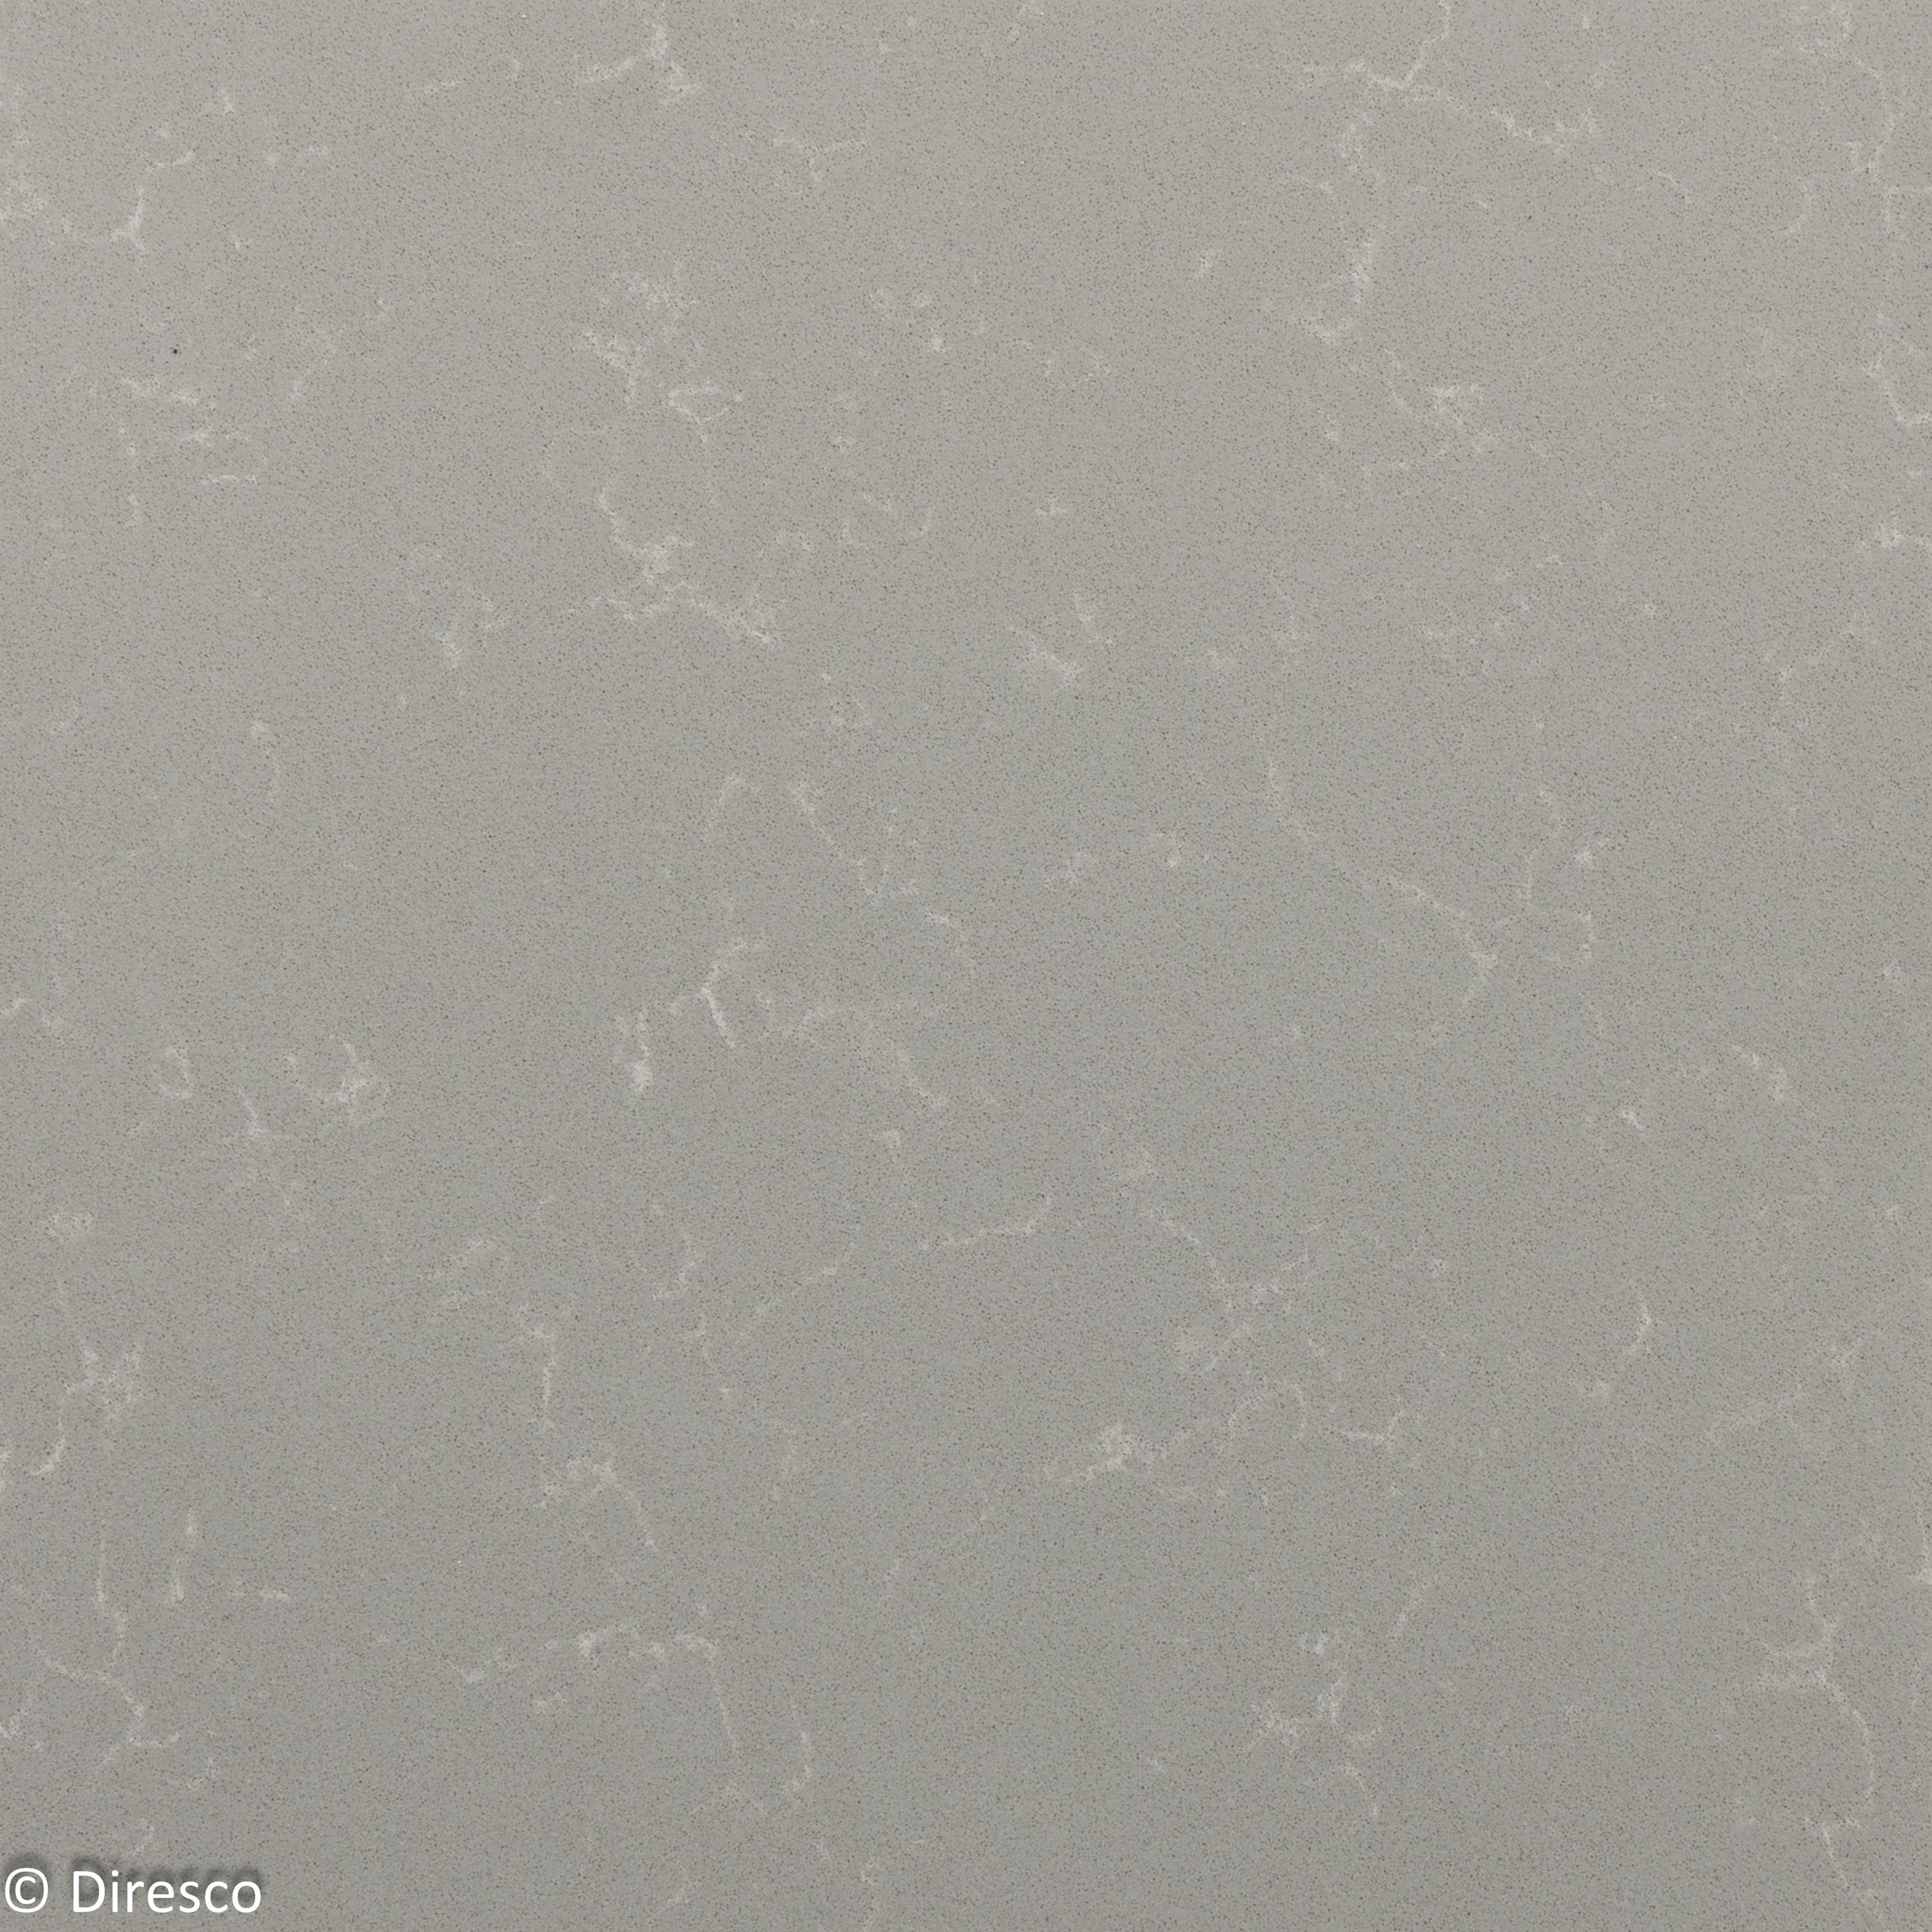 Engineered Stone Tiles For Flooring